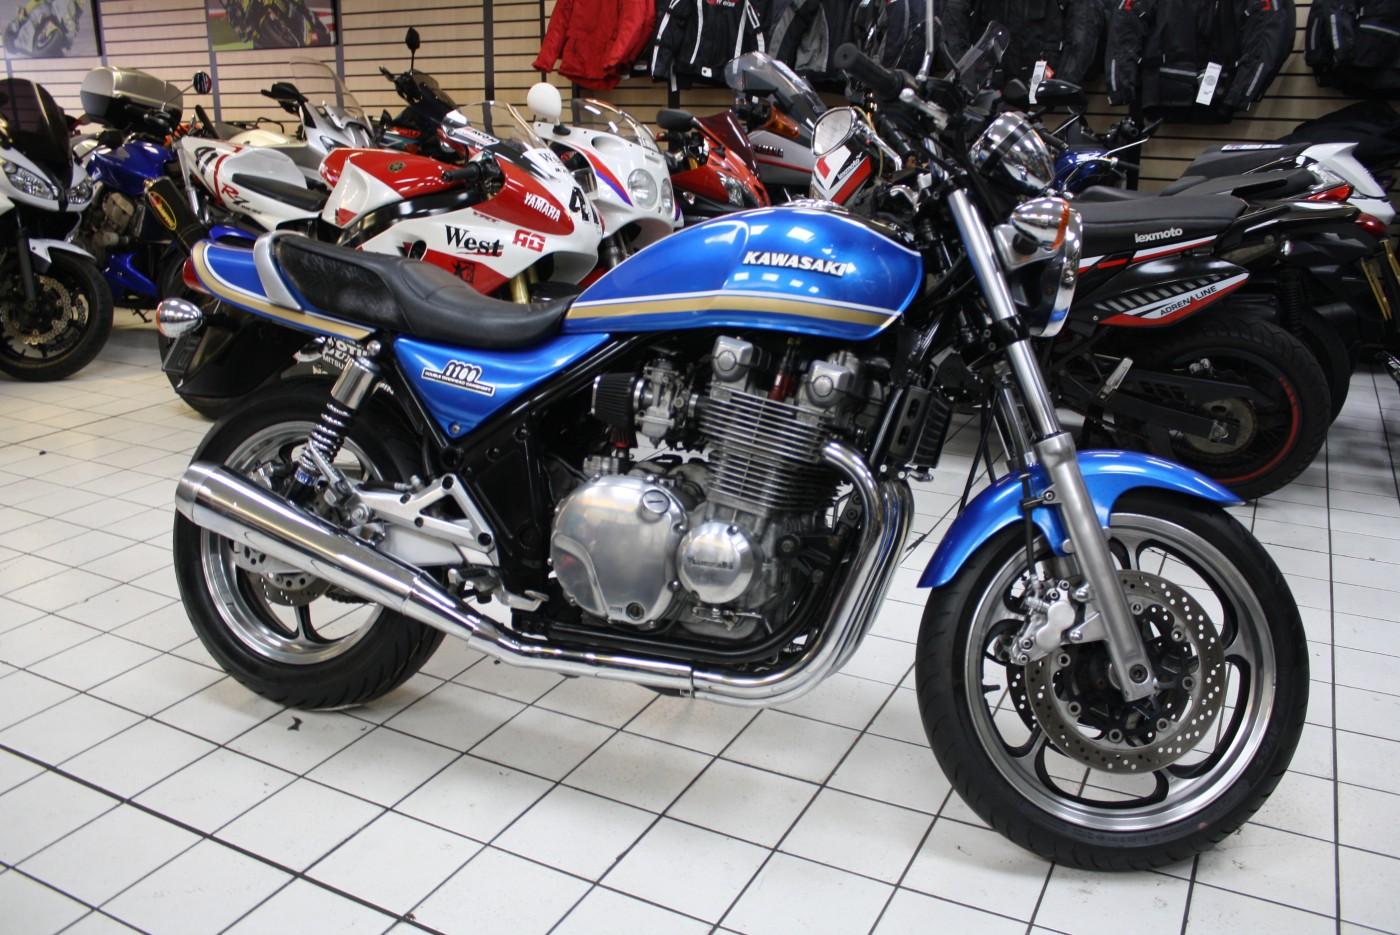 Kawasaki ZR1100 A1 Zephyr